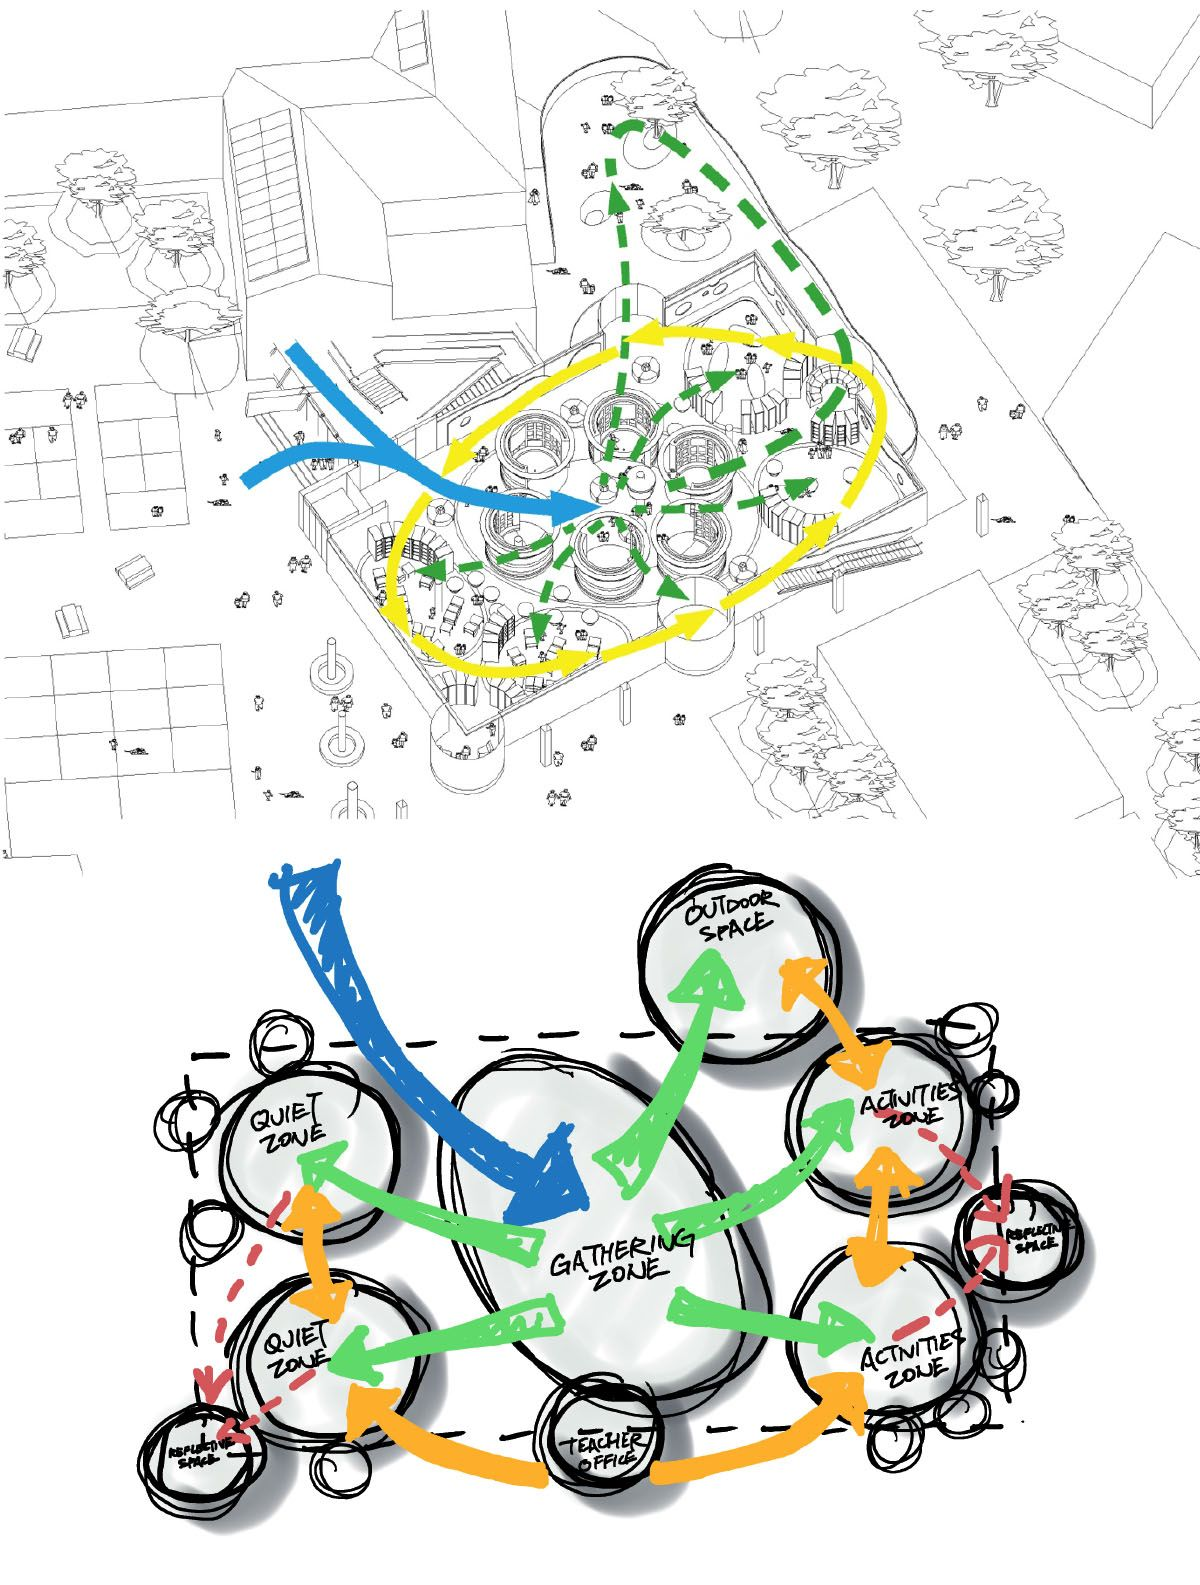 flemington primary school interior design circulation and movement diagrams [ 1200 x 1585 Pixel ]